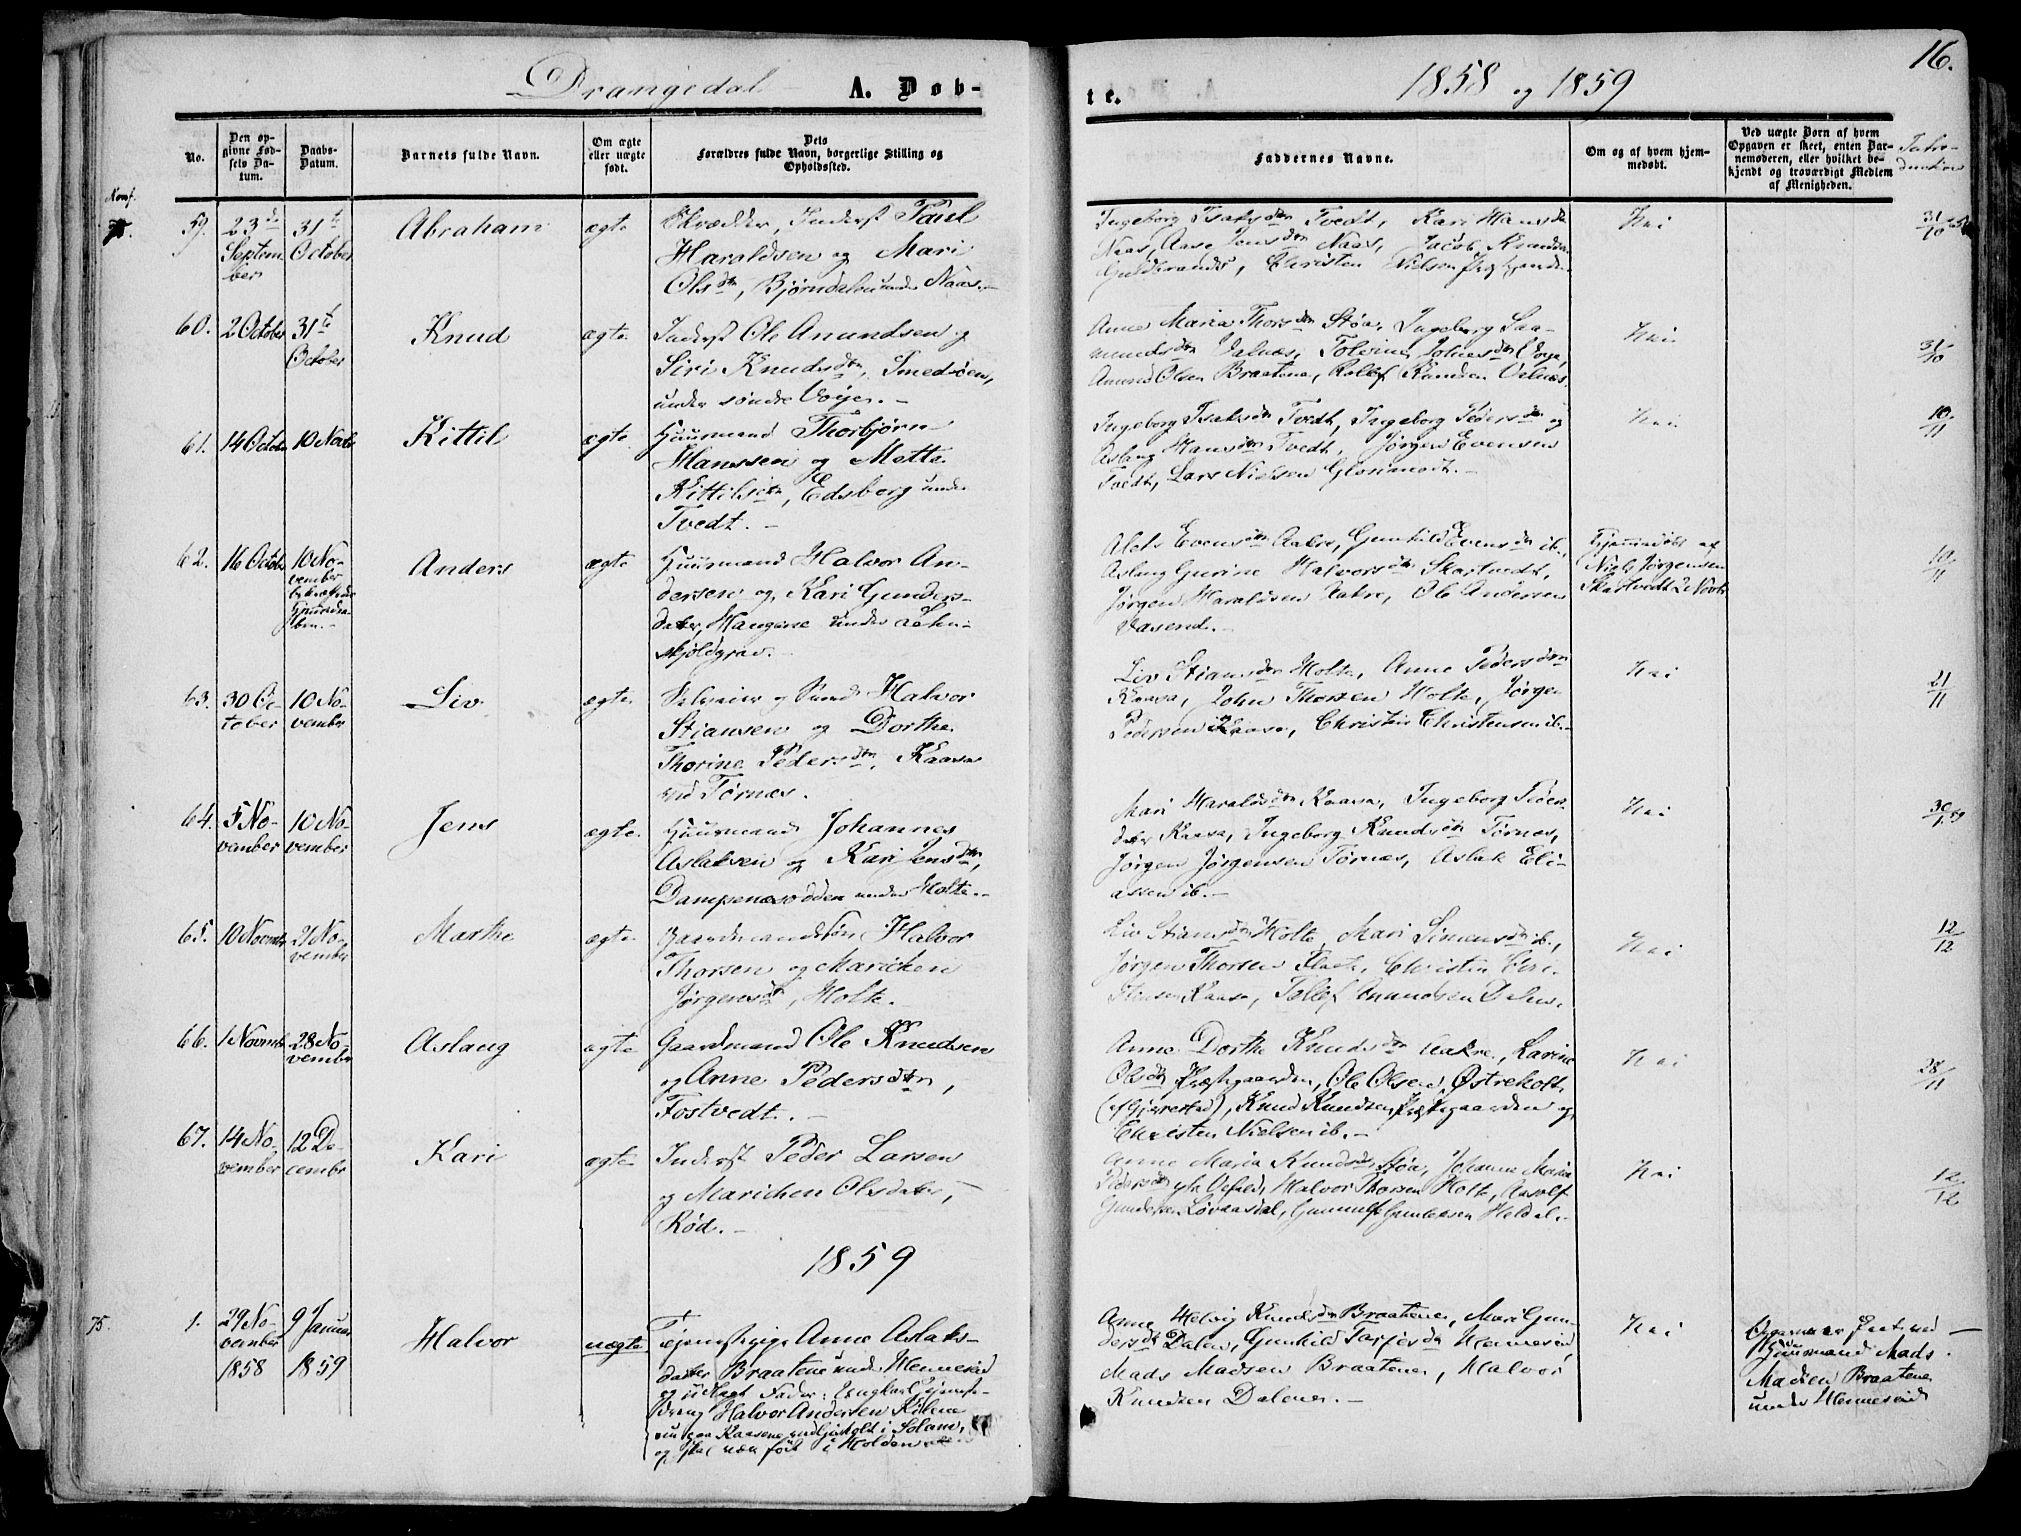 SAKO, Drangedal kirkebøker, F/Fa/L0008: Ministerialbok nr. 8, 1857-1871, s. 16